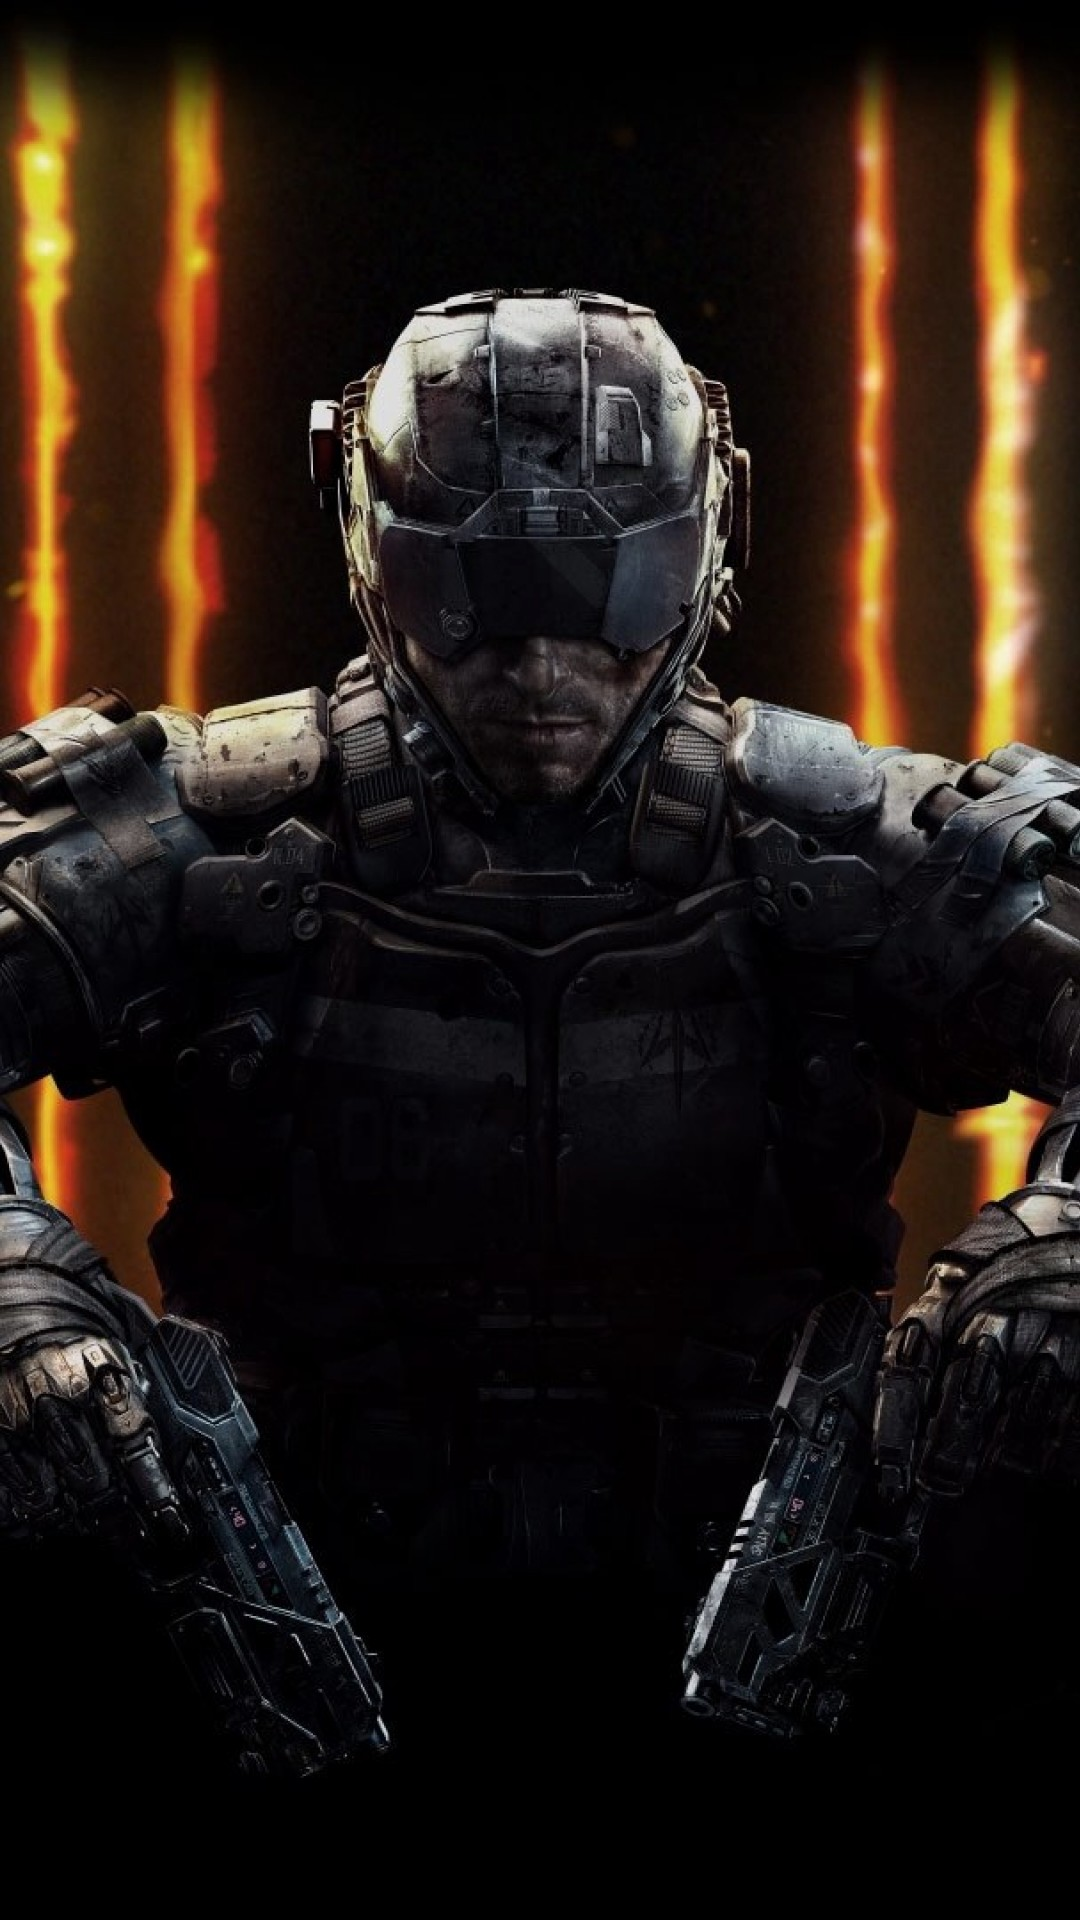 Call Of Duty Black Ops 3 Hd Wallpaper Iphone 6 6s Plus Hd